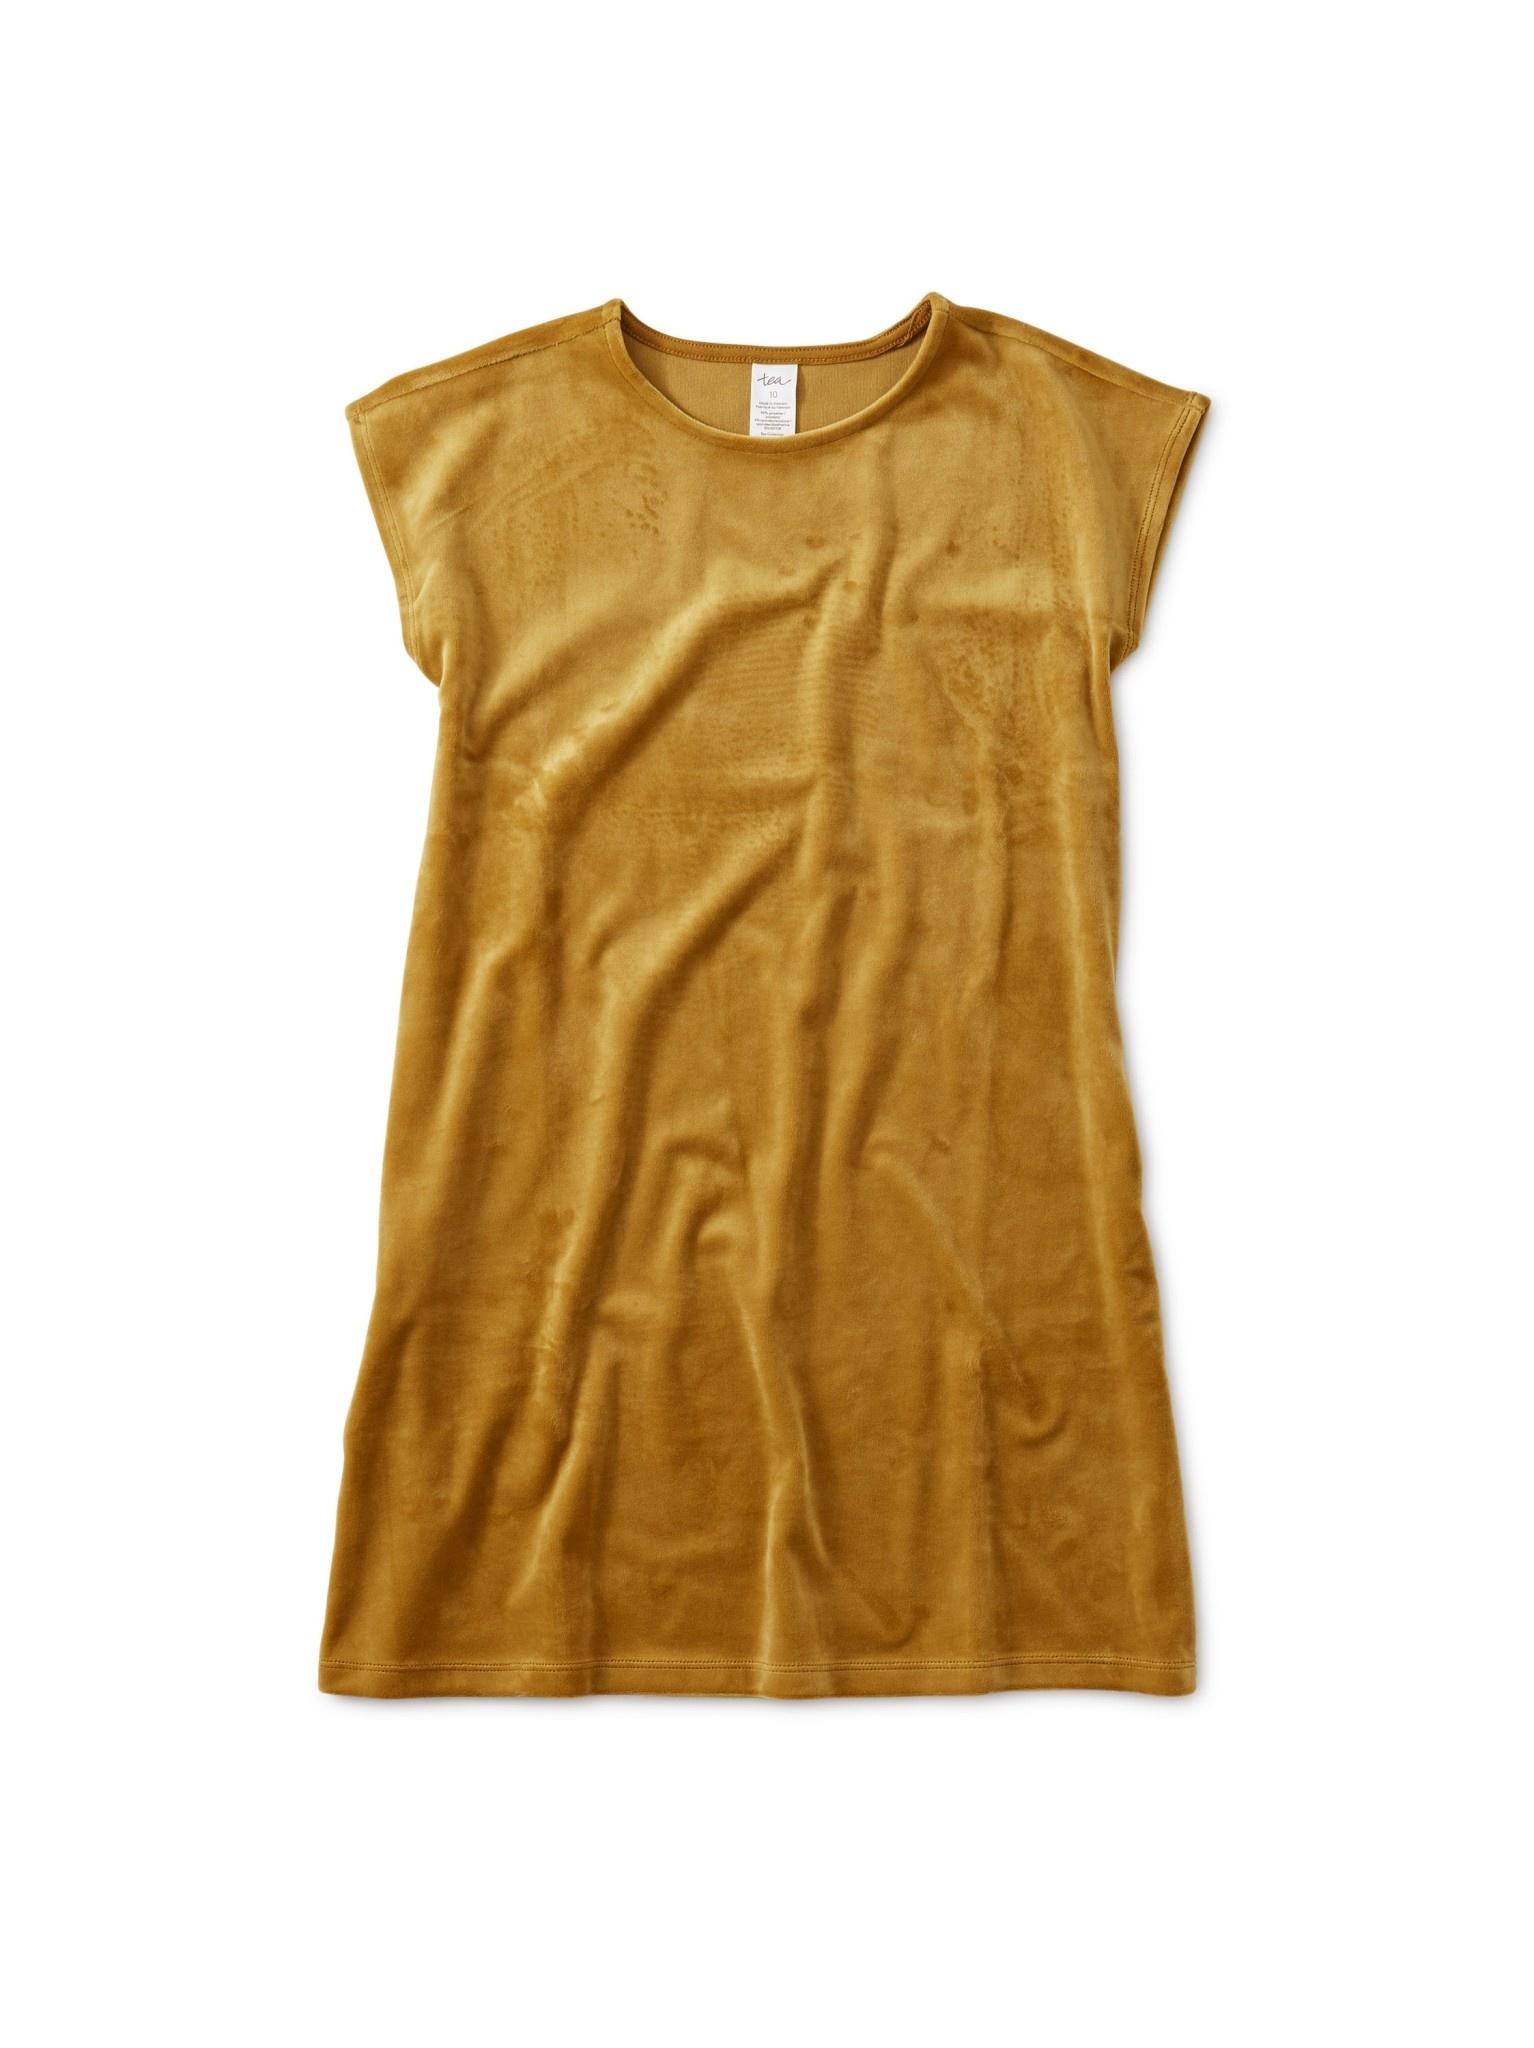 Tea Collection Chestnut Velour Shift Dress